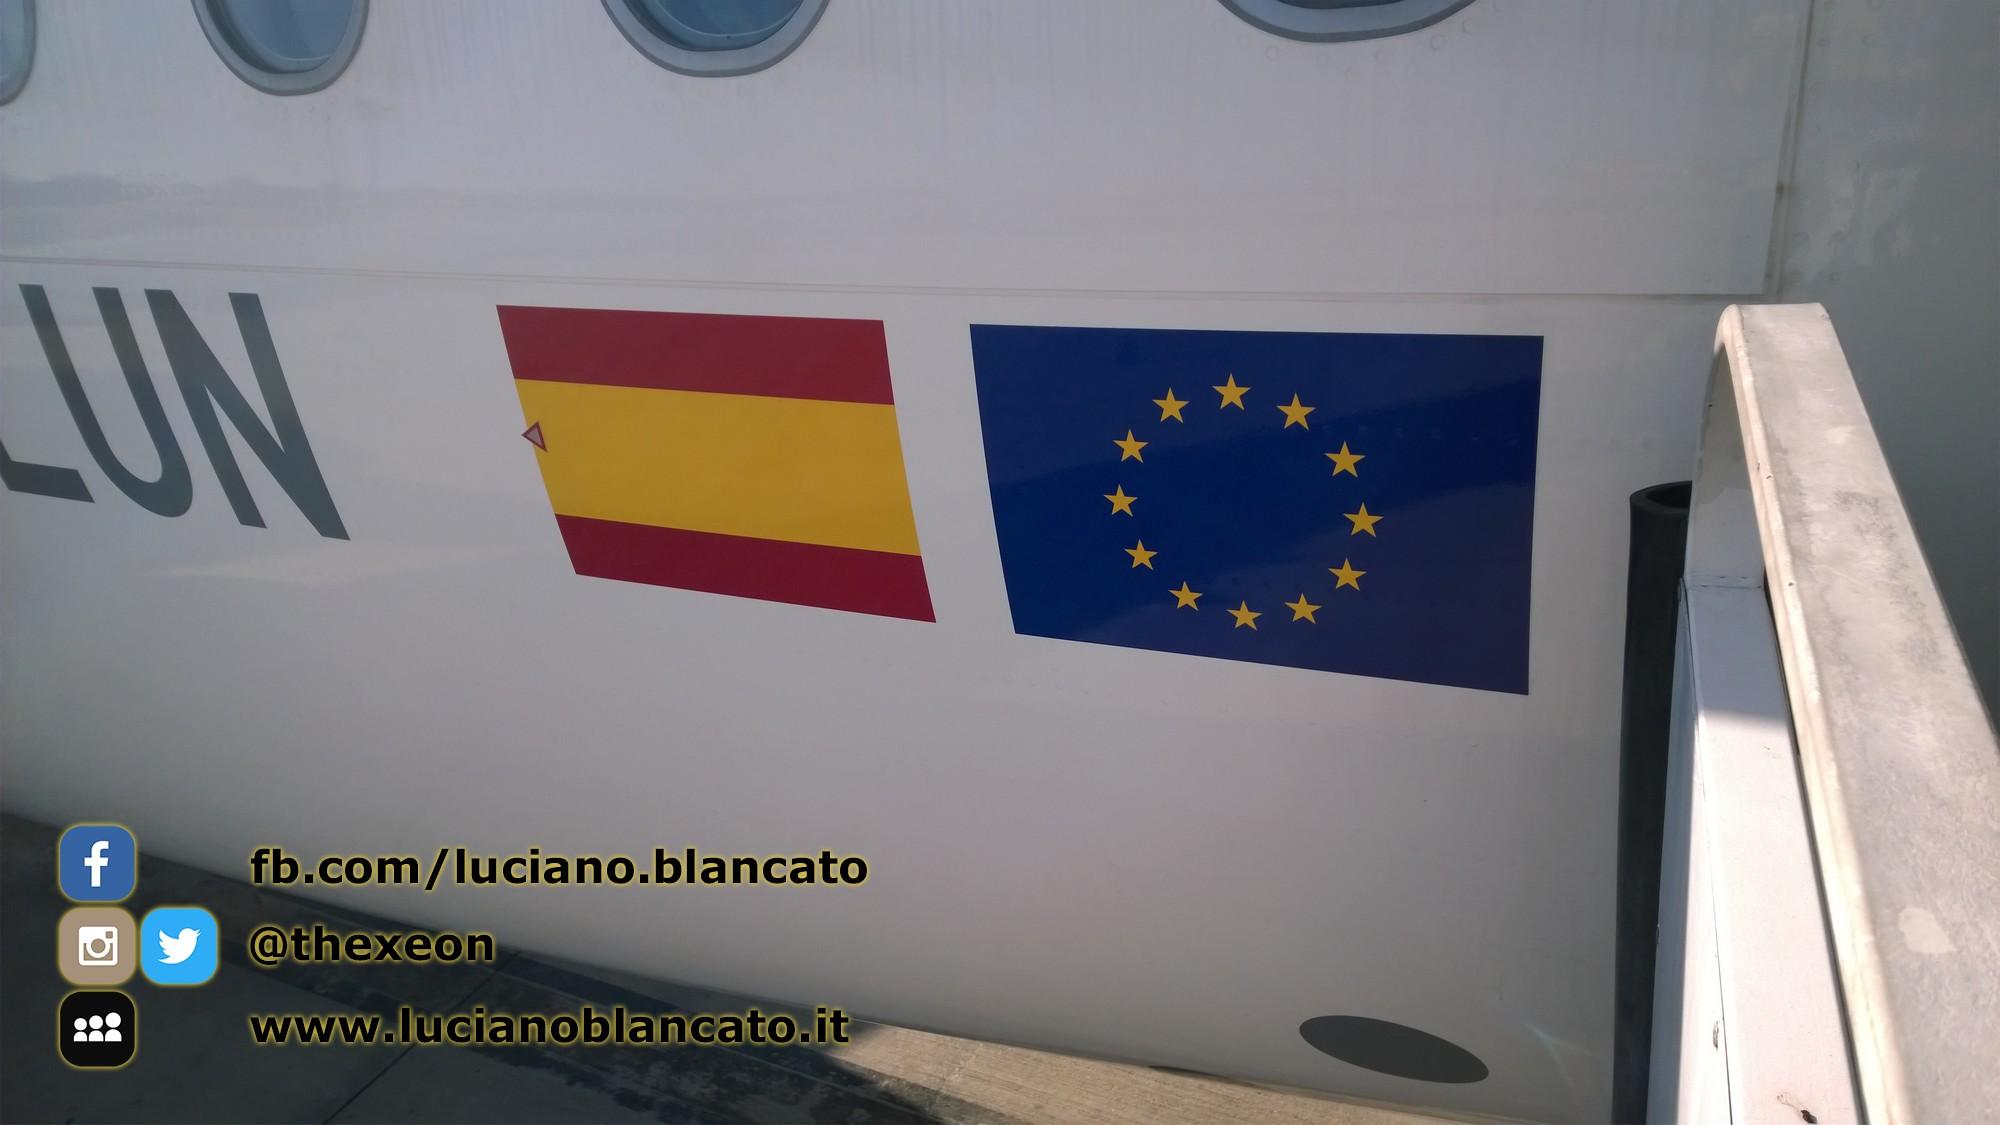 Lisbona - Vueling Airbus - a320 - dettaglio bandiere